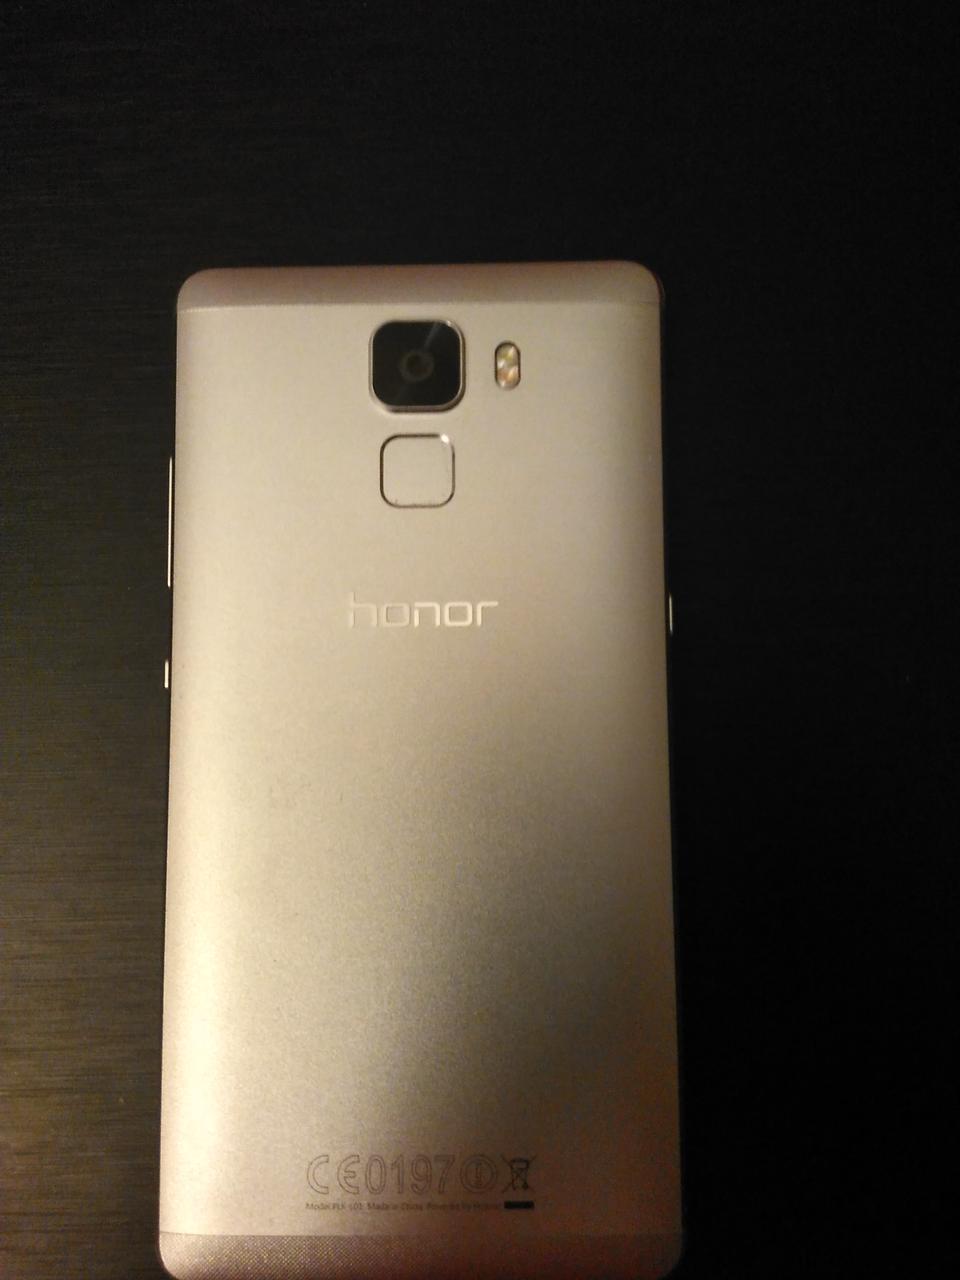 Задняя панель корпуса ( Крышка) для Huawei Honor 7 (PLK-L01) (Золотая)